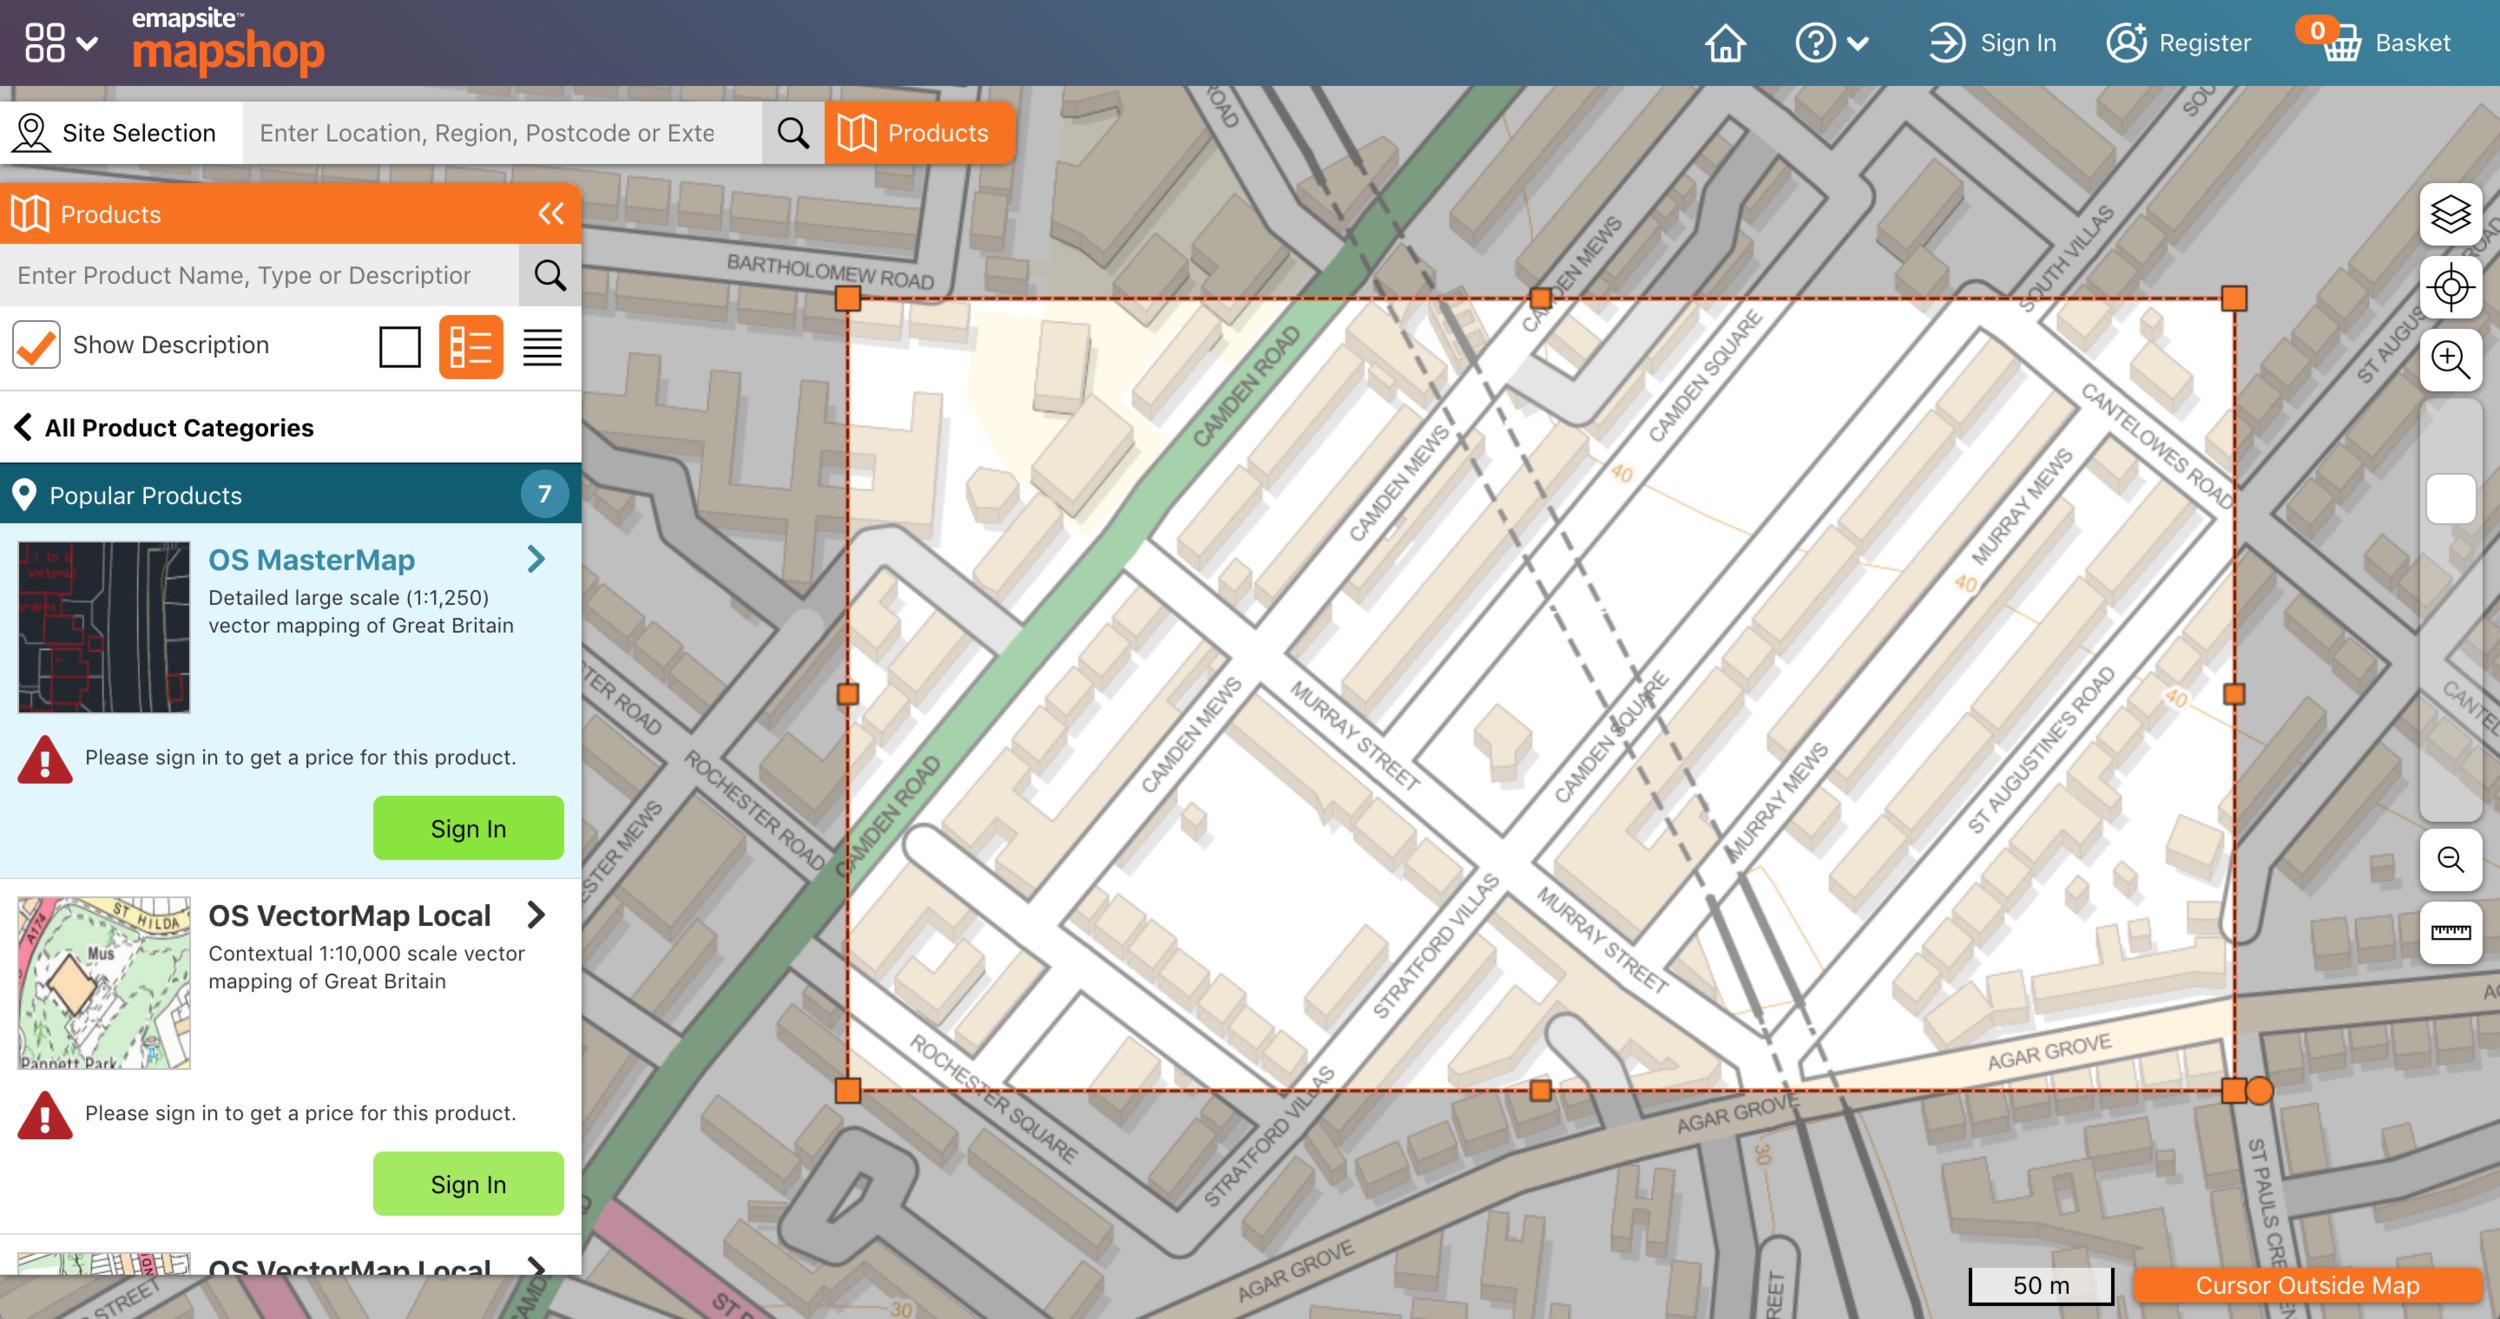 user-interface-designer-emapsite-mapshop.png